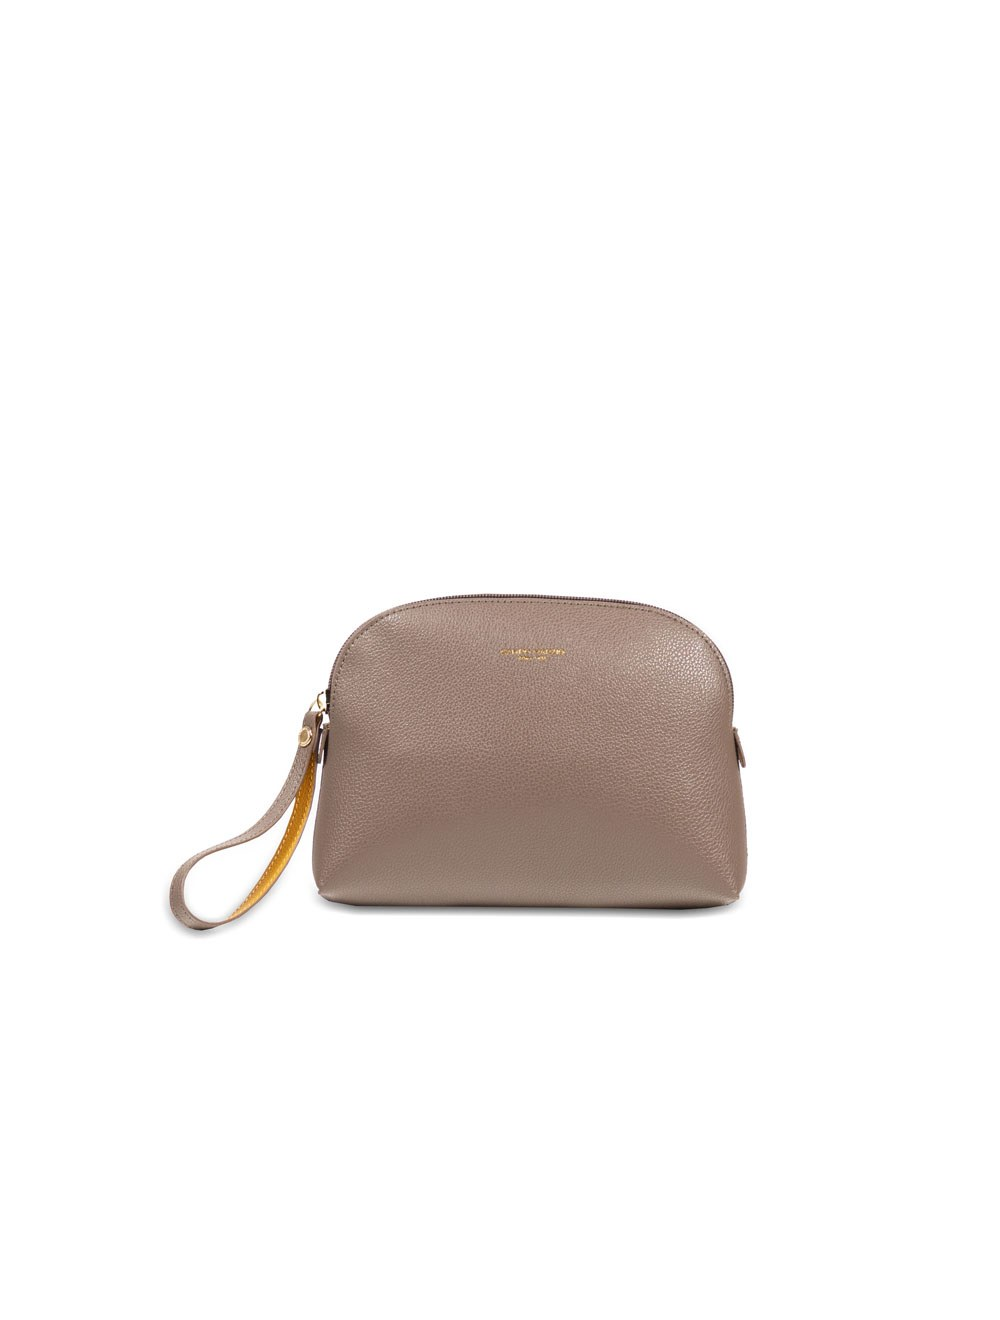 Bag With Wristlet Mini - Taupe